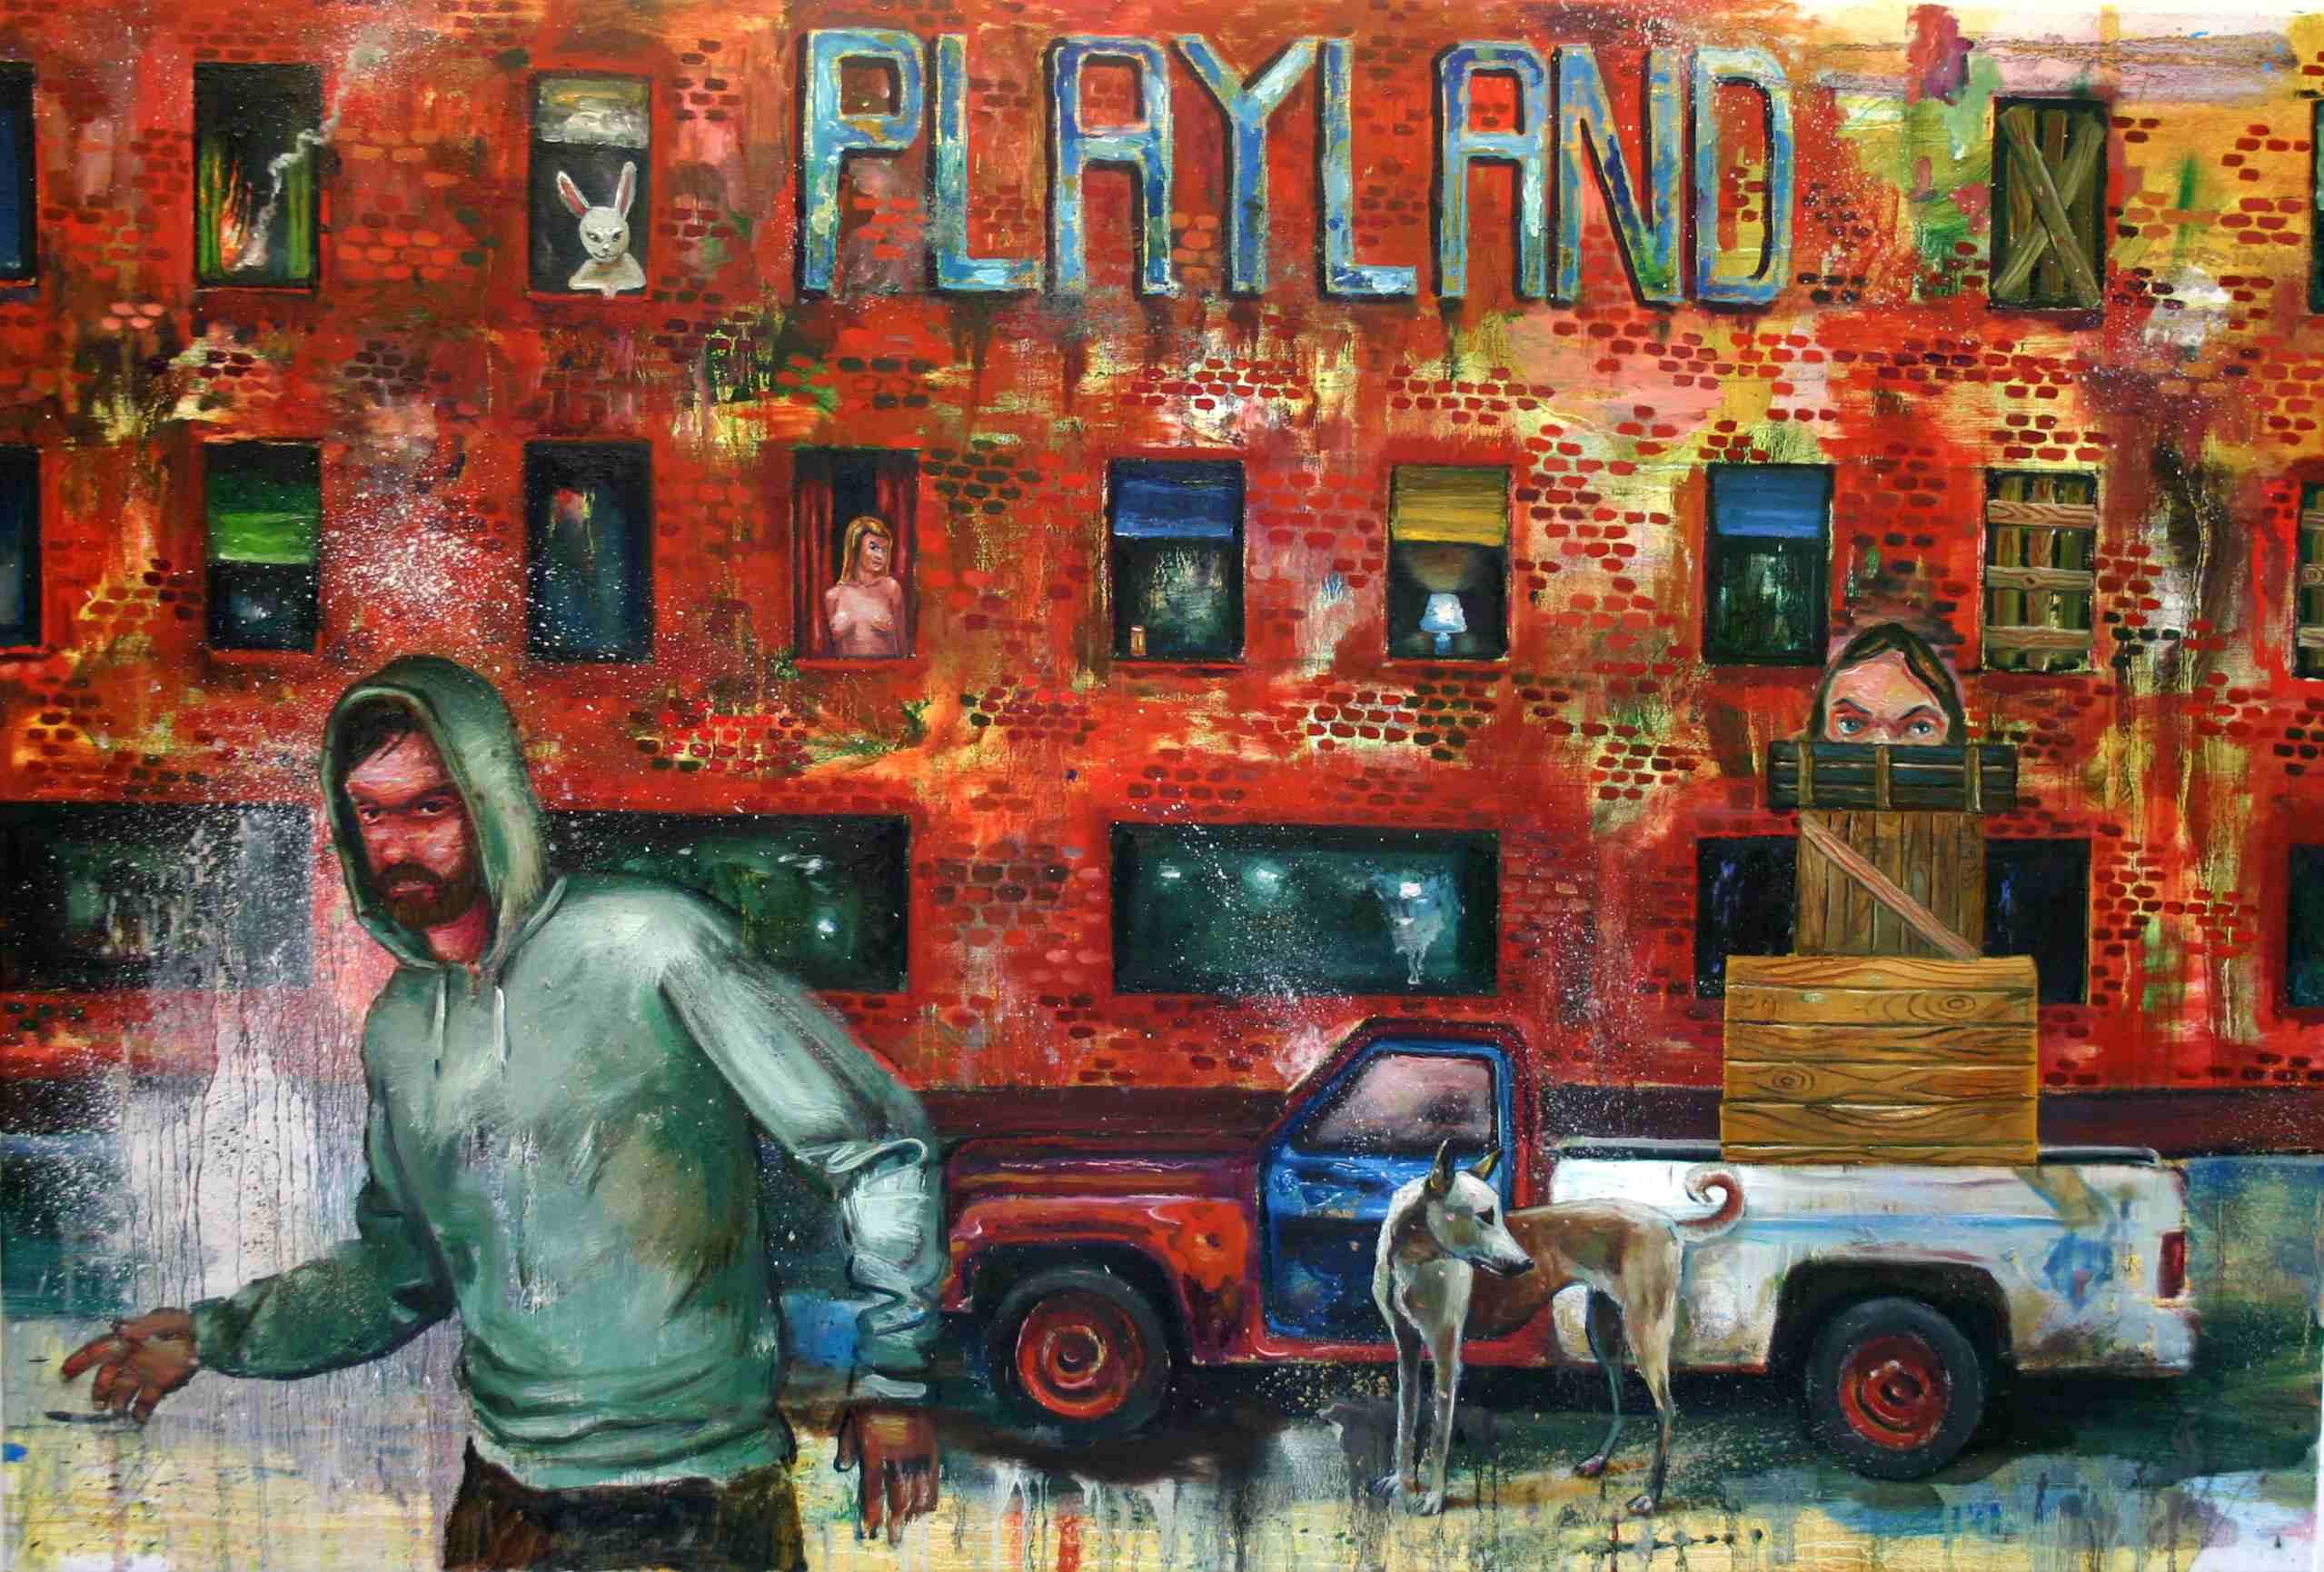 Olle Schmidt, Late Sunday Night, 2016, oil on canvas, 81 x 120 cm